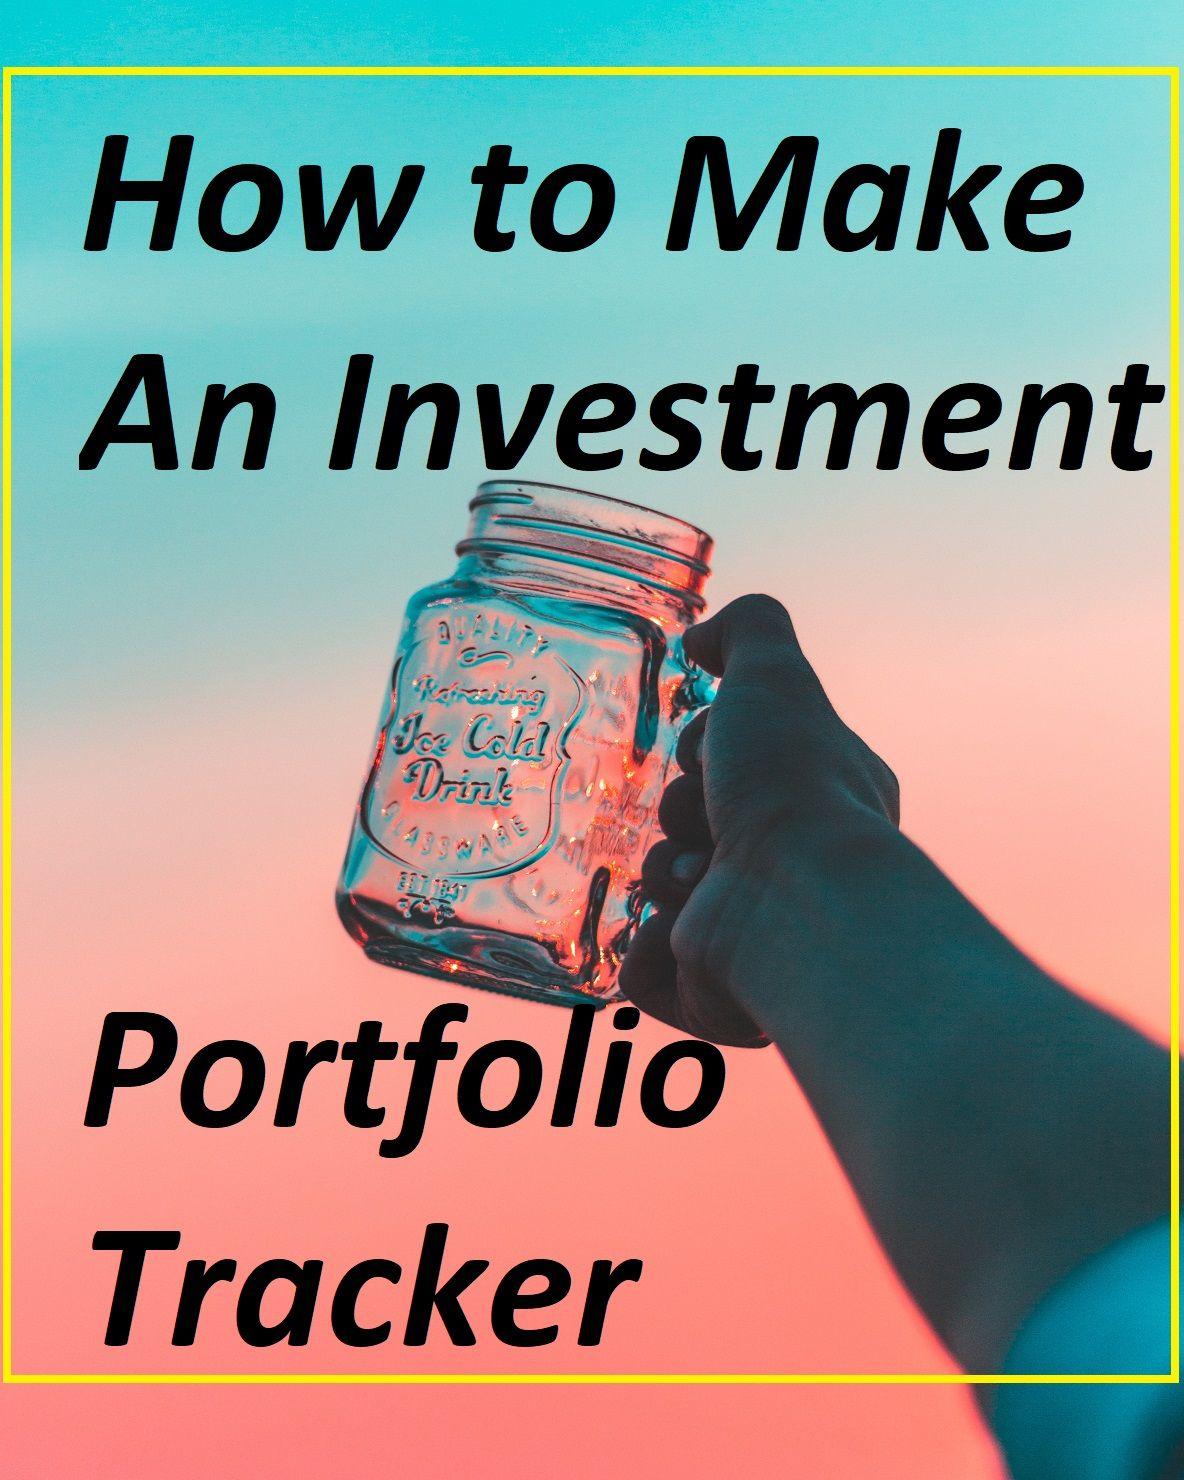 how to make an investment portfolio tracker using google spreadsheet